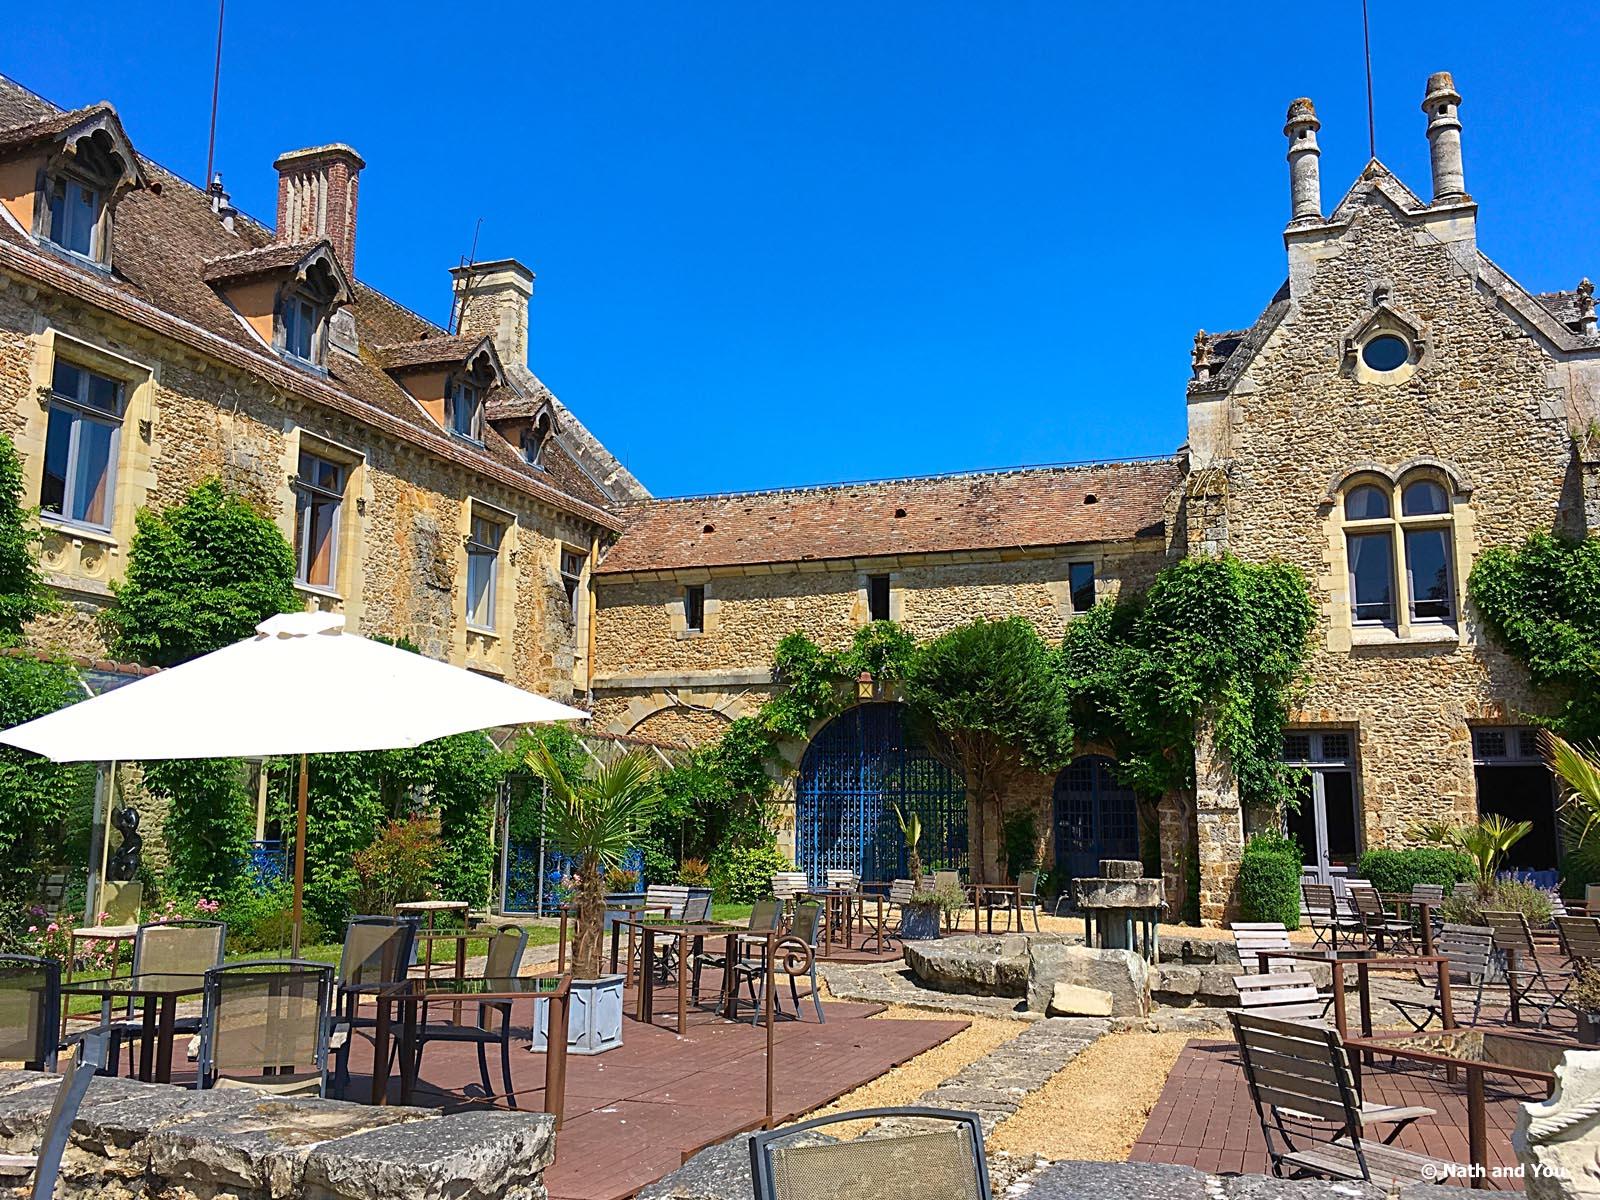 Abbaye des vaux de cernay brunch for Abbaye des vaux de cernay piscine